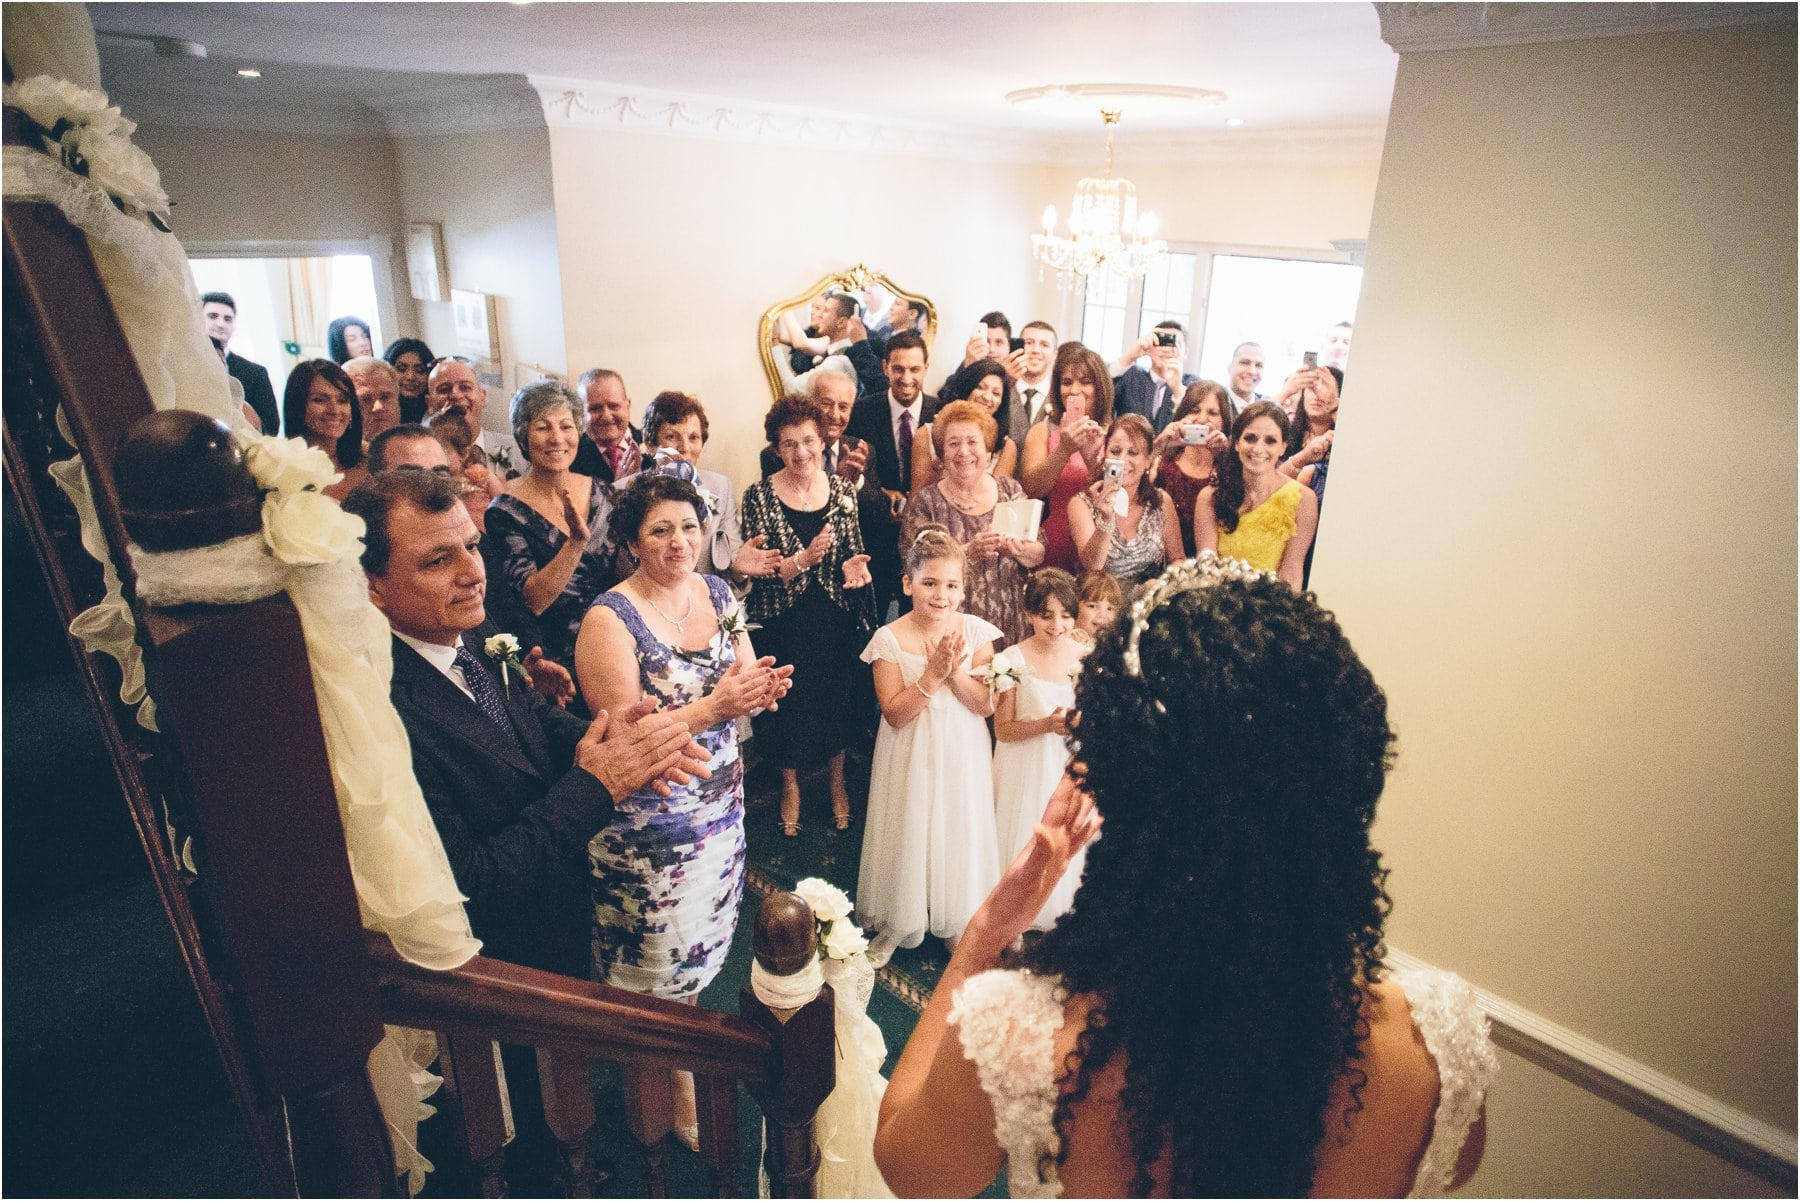 Midland_Manchester_Wedding_Photography_0045